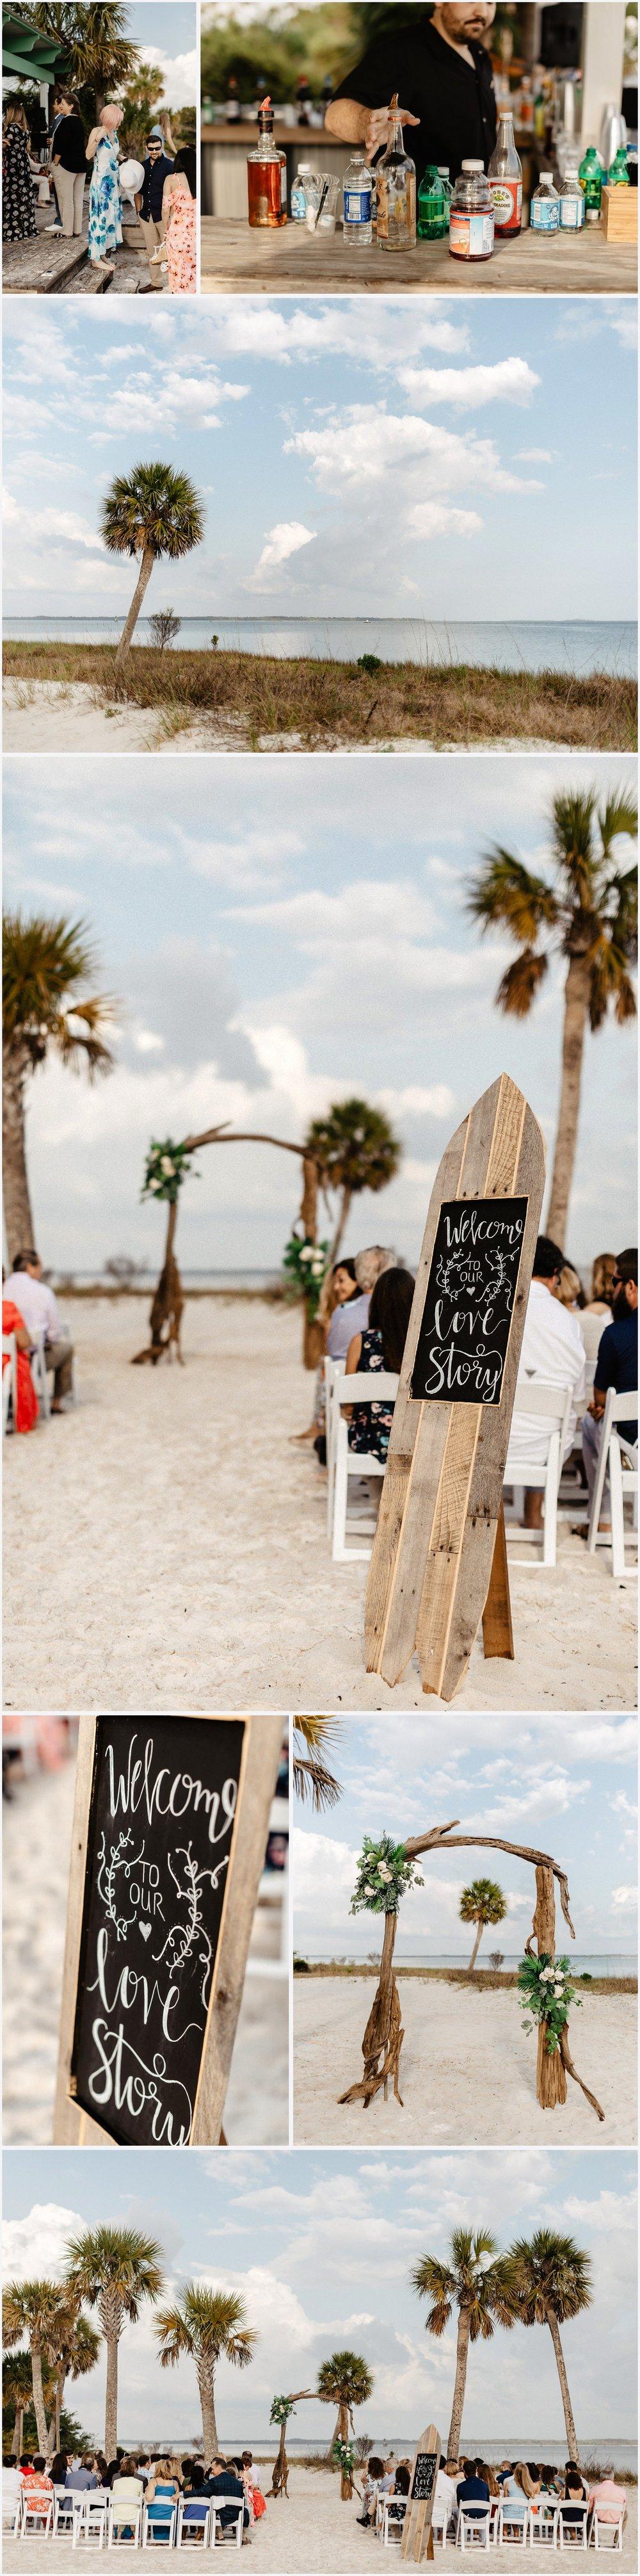 Sheraton Bay Point Resort Wedding_0010.jpg